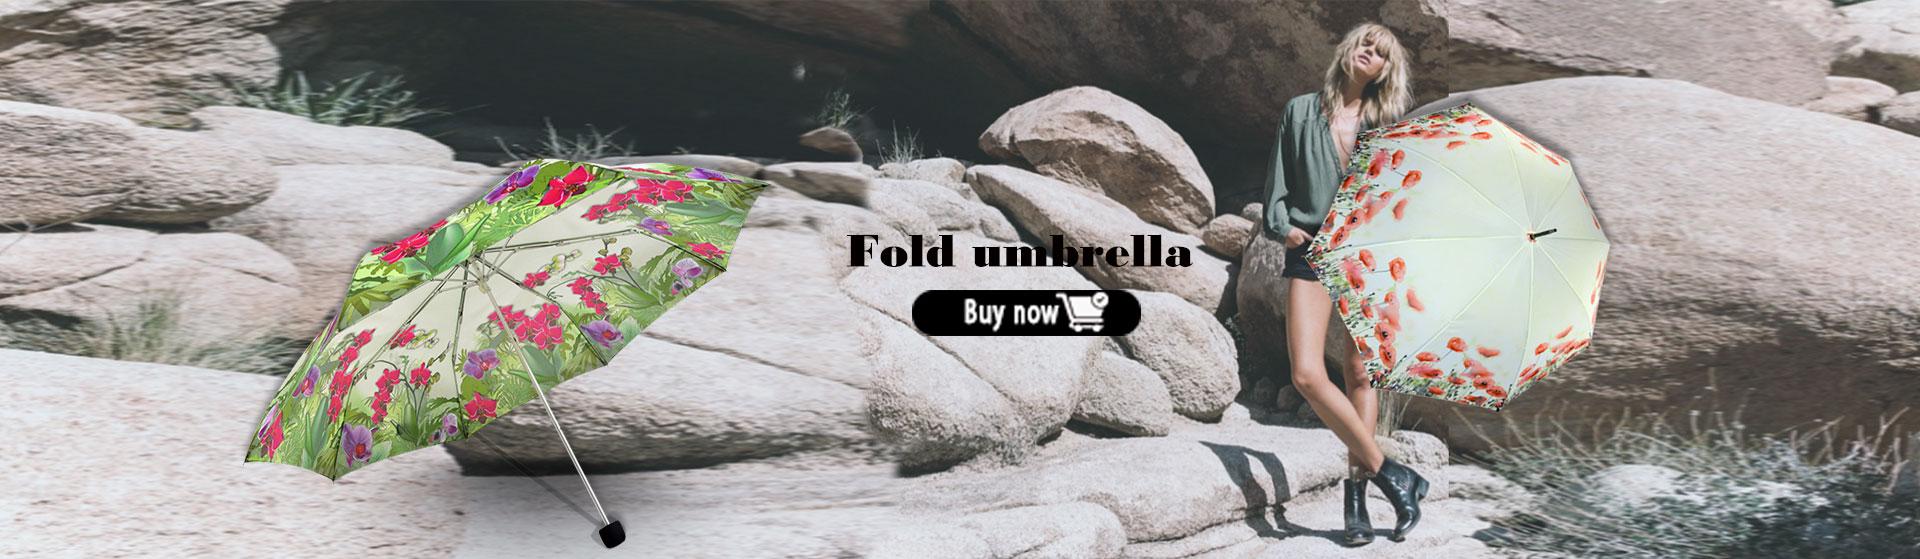 Fold-Umbrella